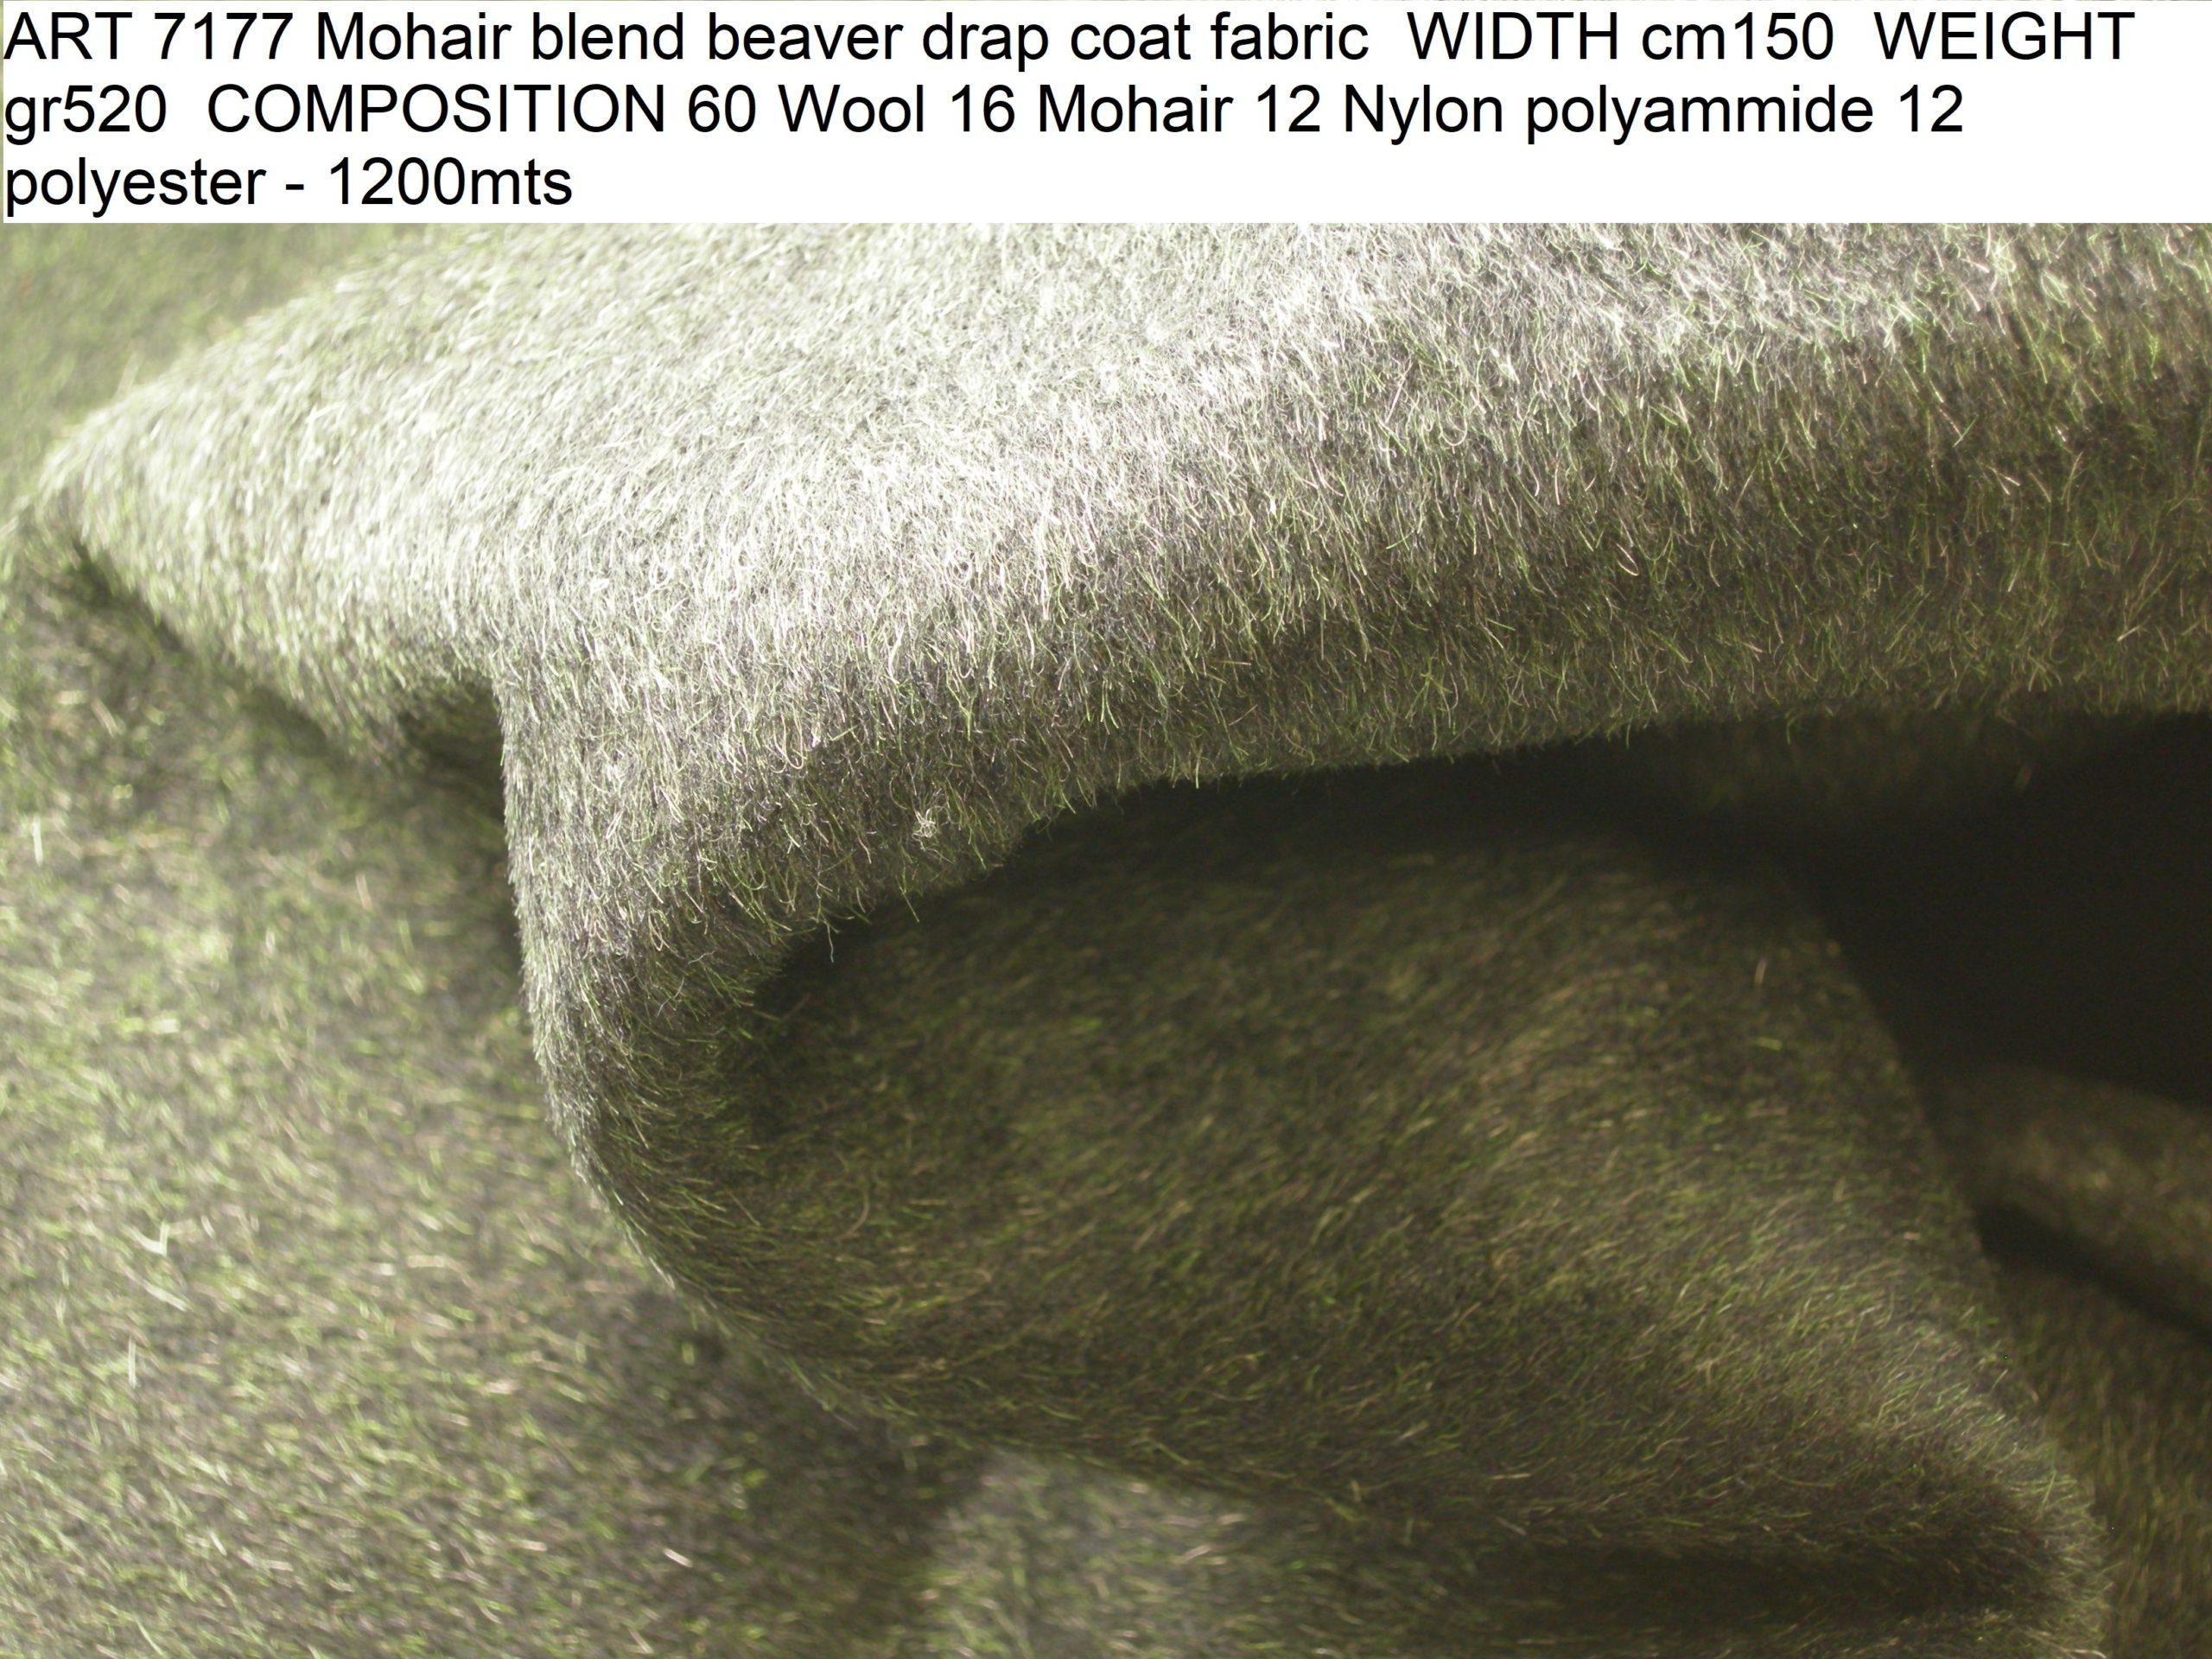 ART 7177 Mohair blend beaver drap coat fabric WIDTH cm150 WEIGHT gr520 COMPOSITION 60 Wool 16 Mohair 12 Nylon polyammide 12 polyester - 1200mts